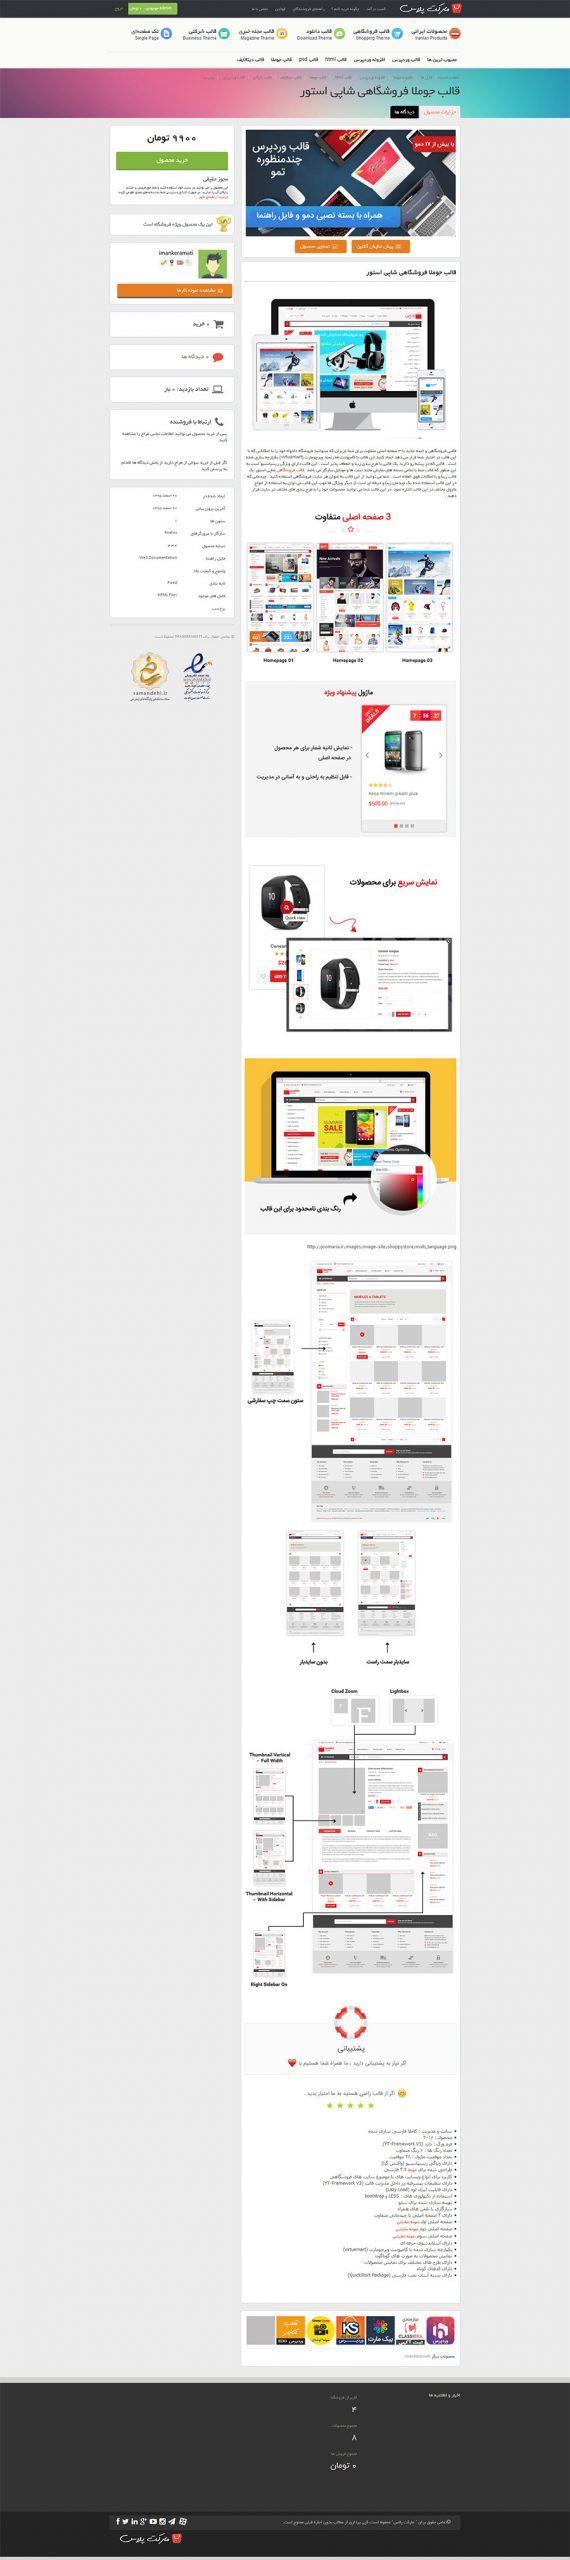 product scaled - قالب وردپرس فروش فایل مارکت پلاس EDD